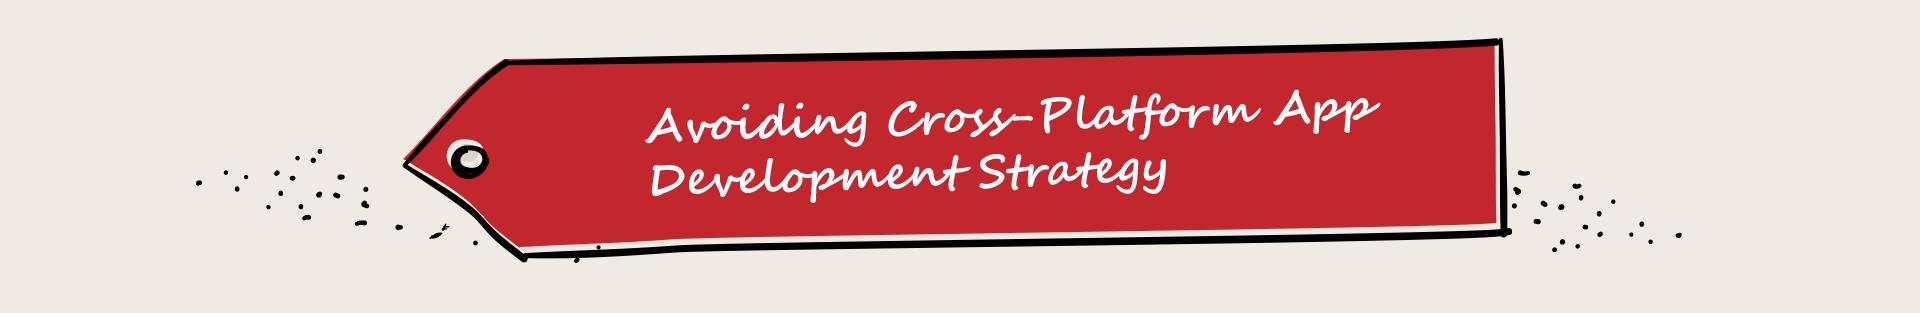 Avoiding Cross-Platform App Development Strategy